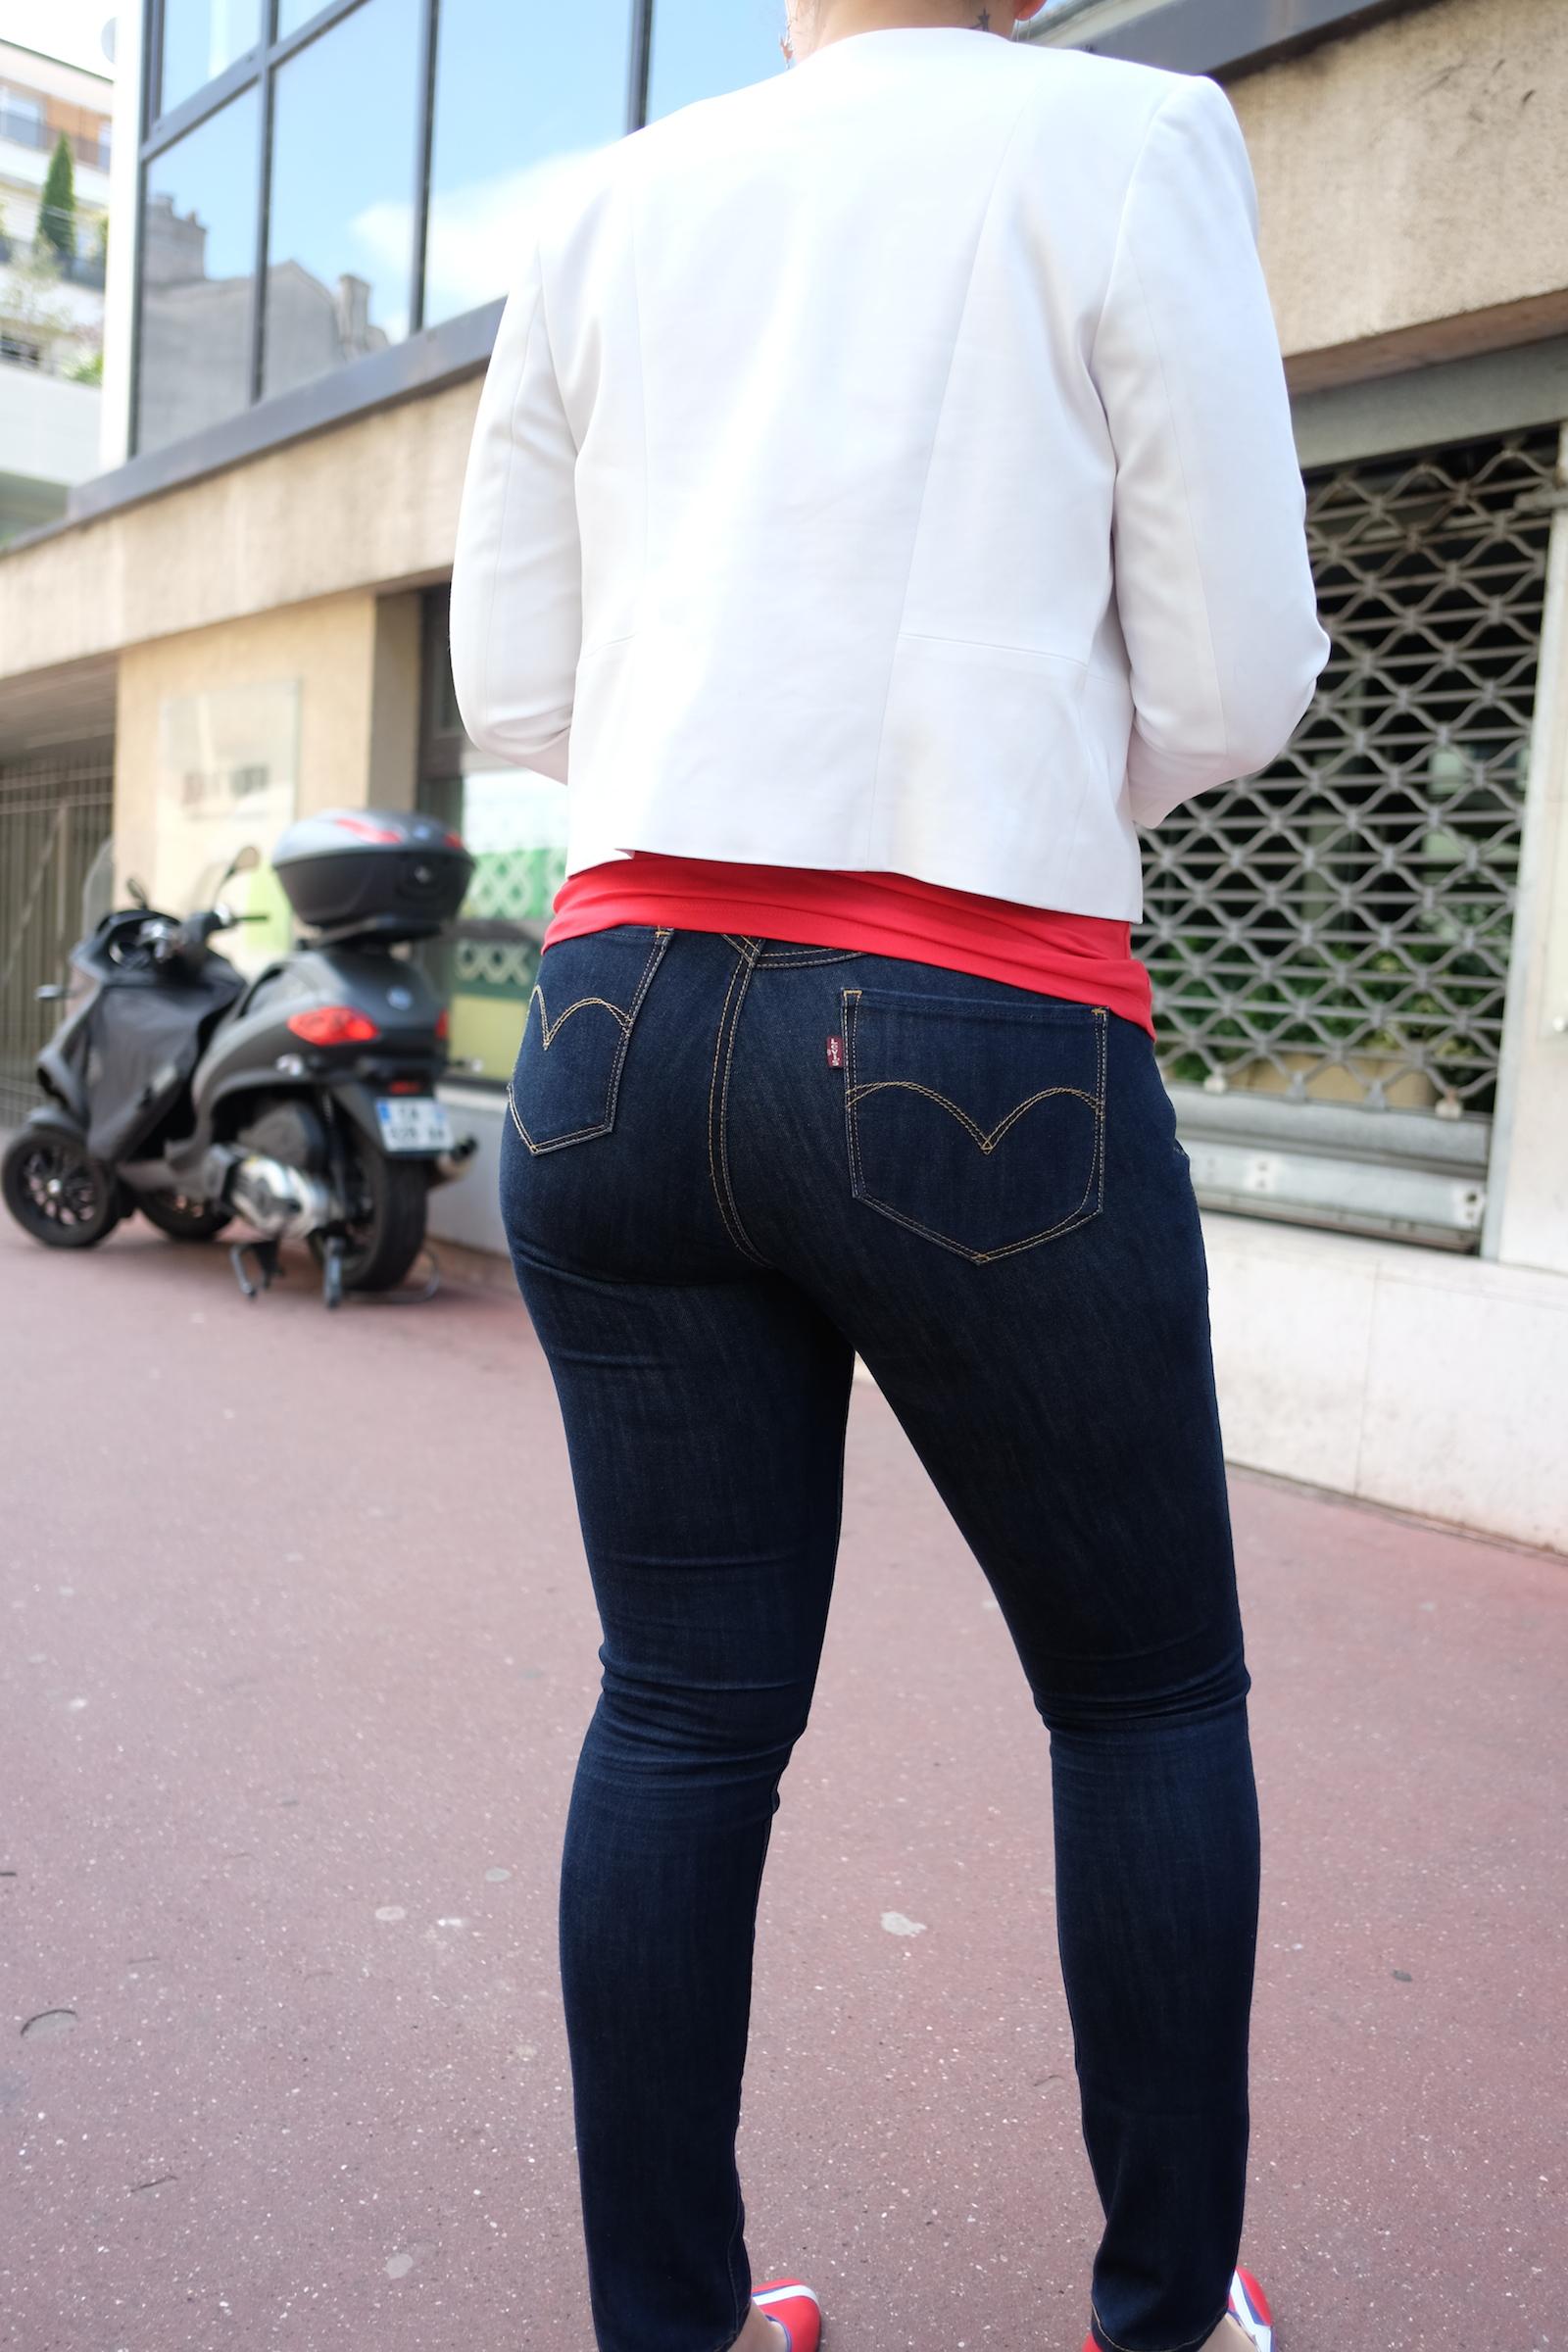 Miss Coquines Bondy Horaires, 10 Rue Gatine